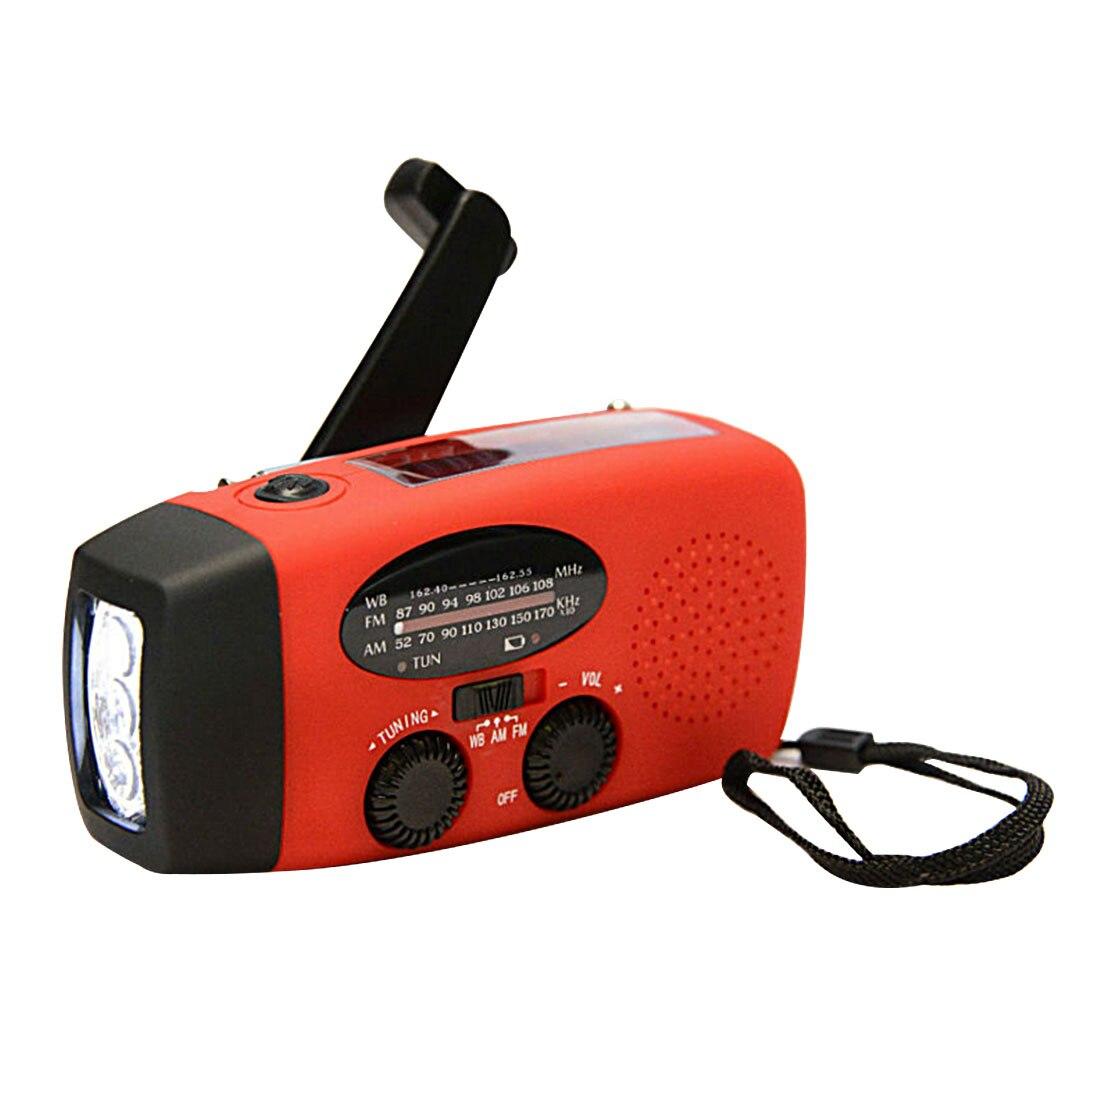 Portable Audio & Video Marsnaska Solar Radio Hand Crank Self Powered Phone Charger 3 Led Flashlight Am/fm/wb Radio Waterpr Waterproof Shock-Resistant And Antimagnetic Radio